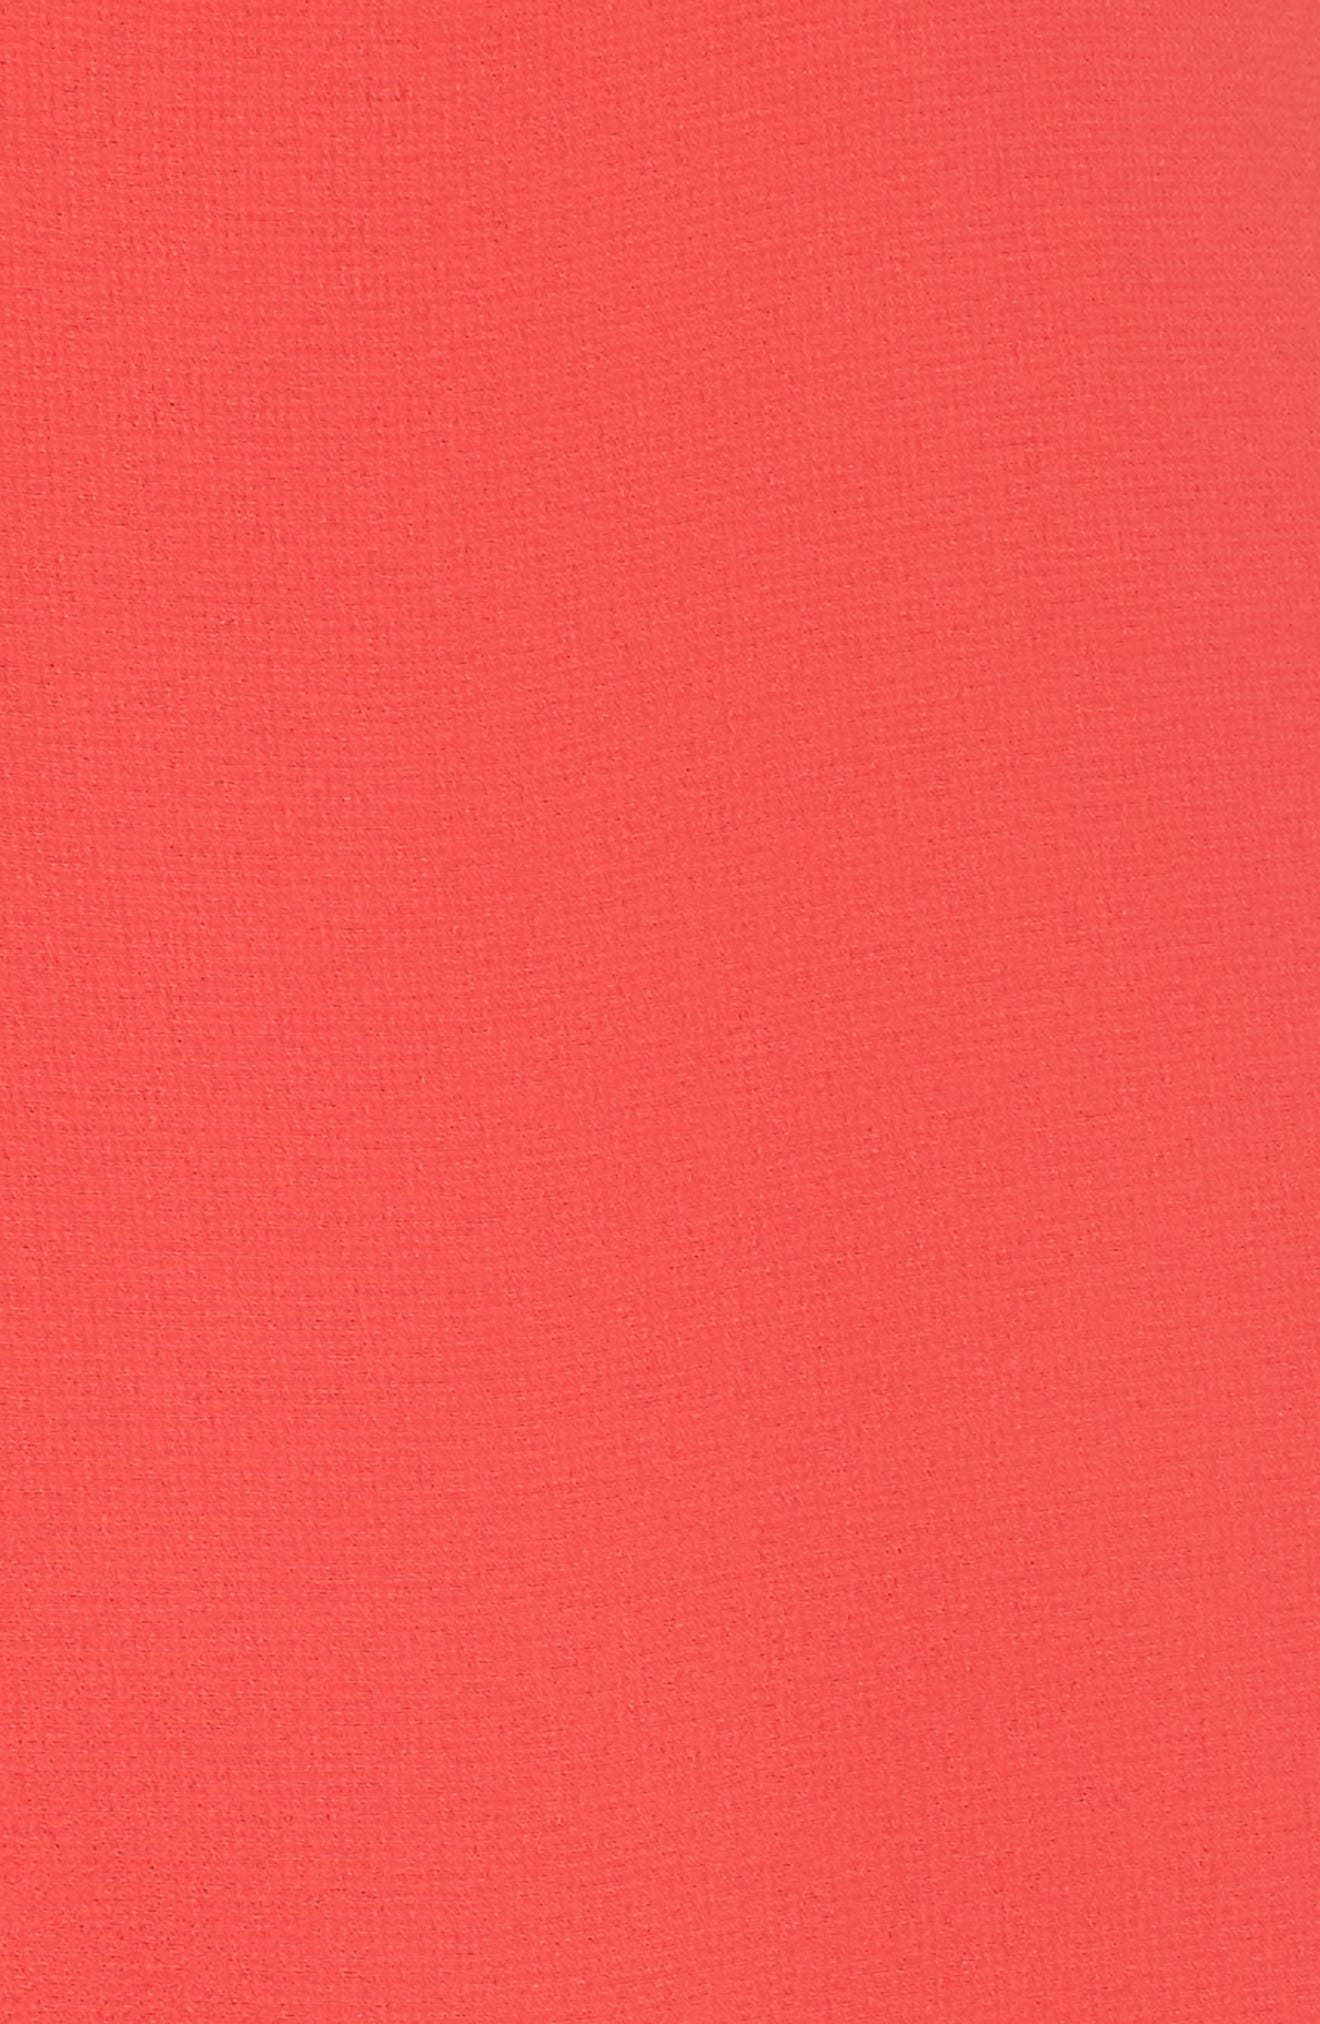 Soufflé V-Neck Chiffon Dress,                             Alternate thumbnail 6, color,                             STRAWBERRY